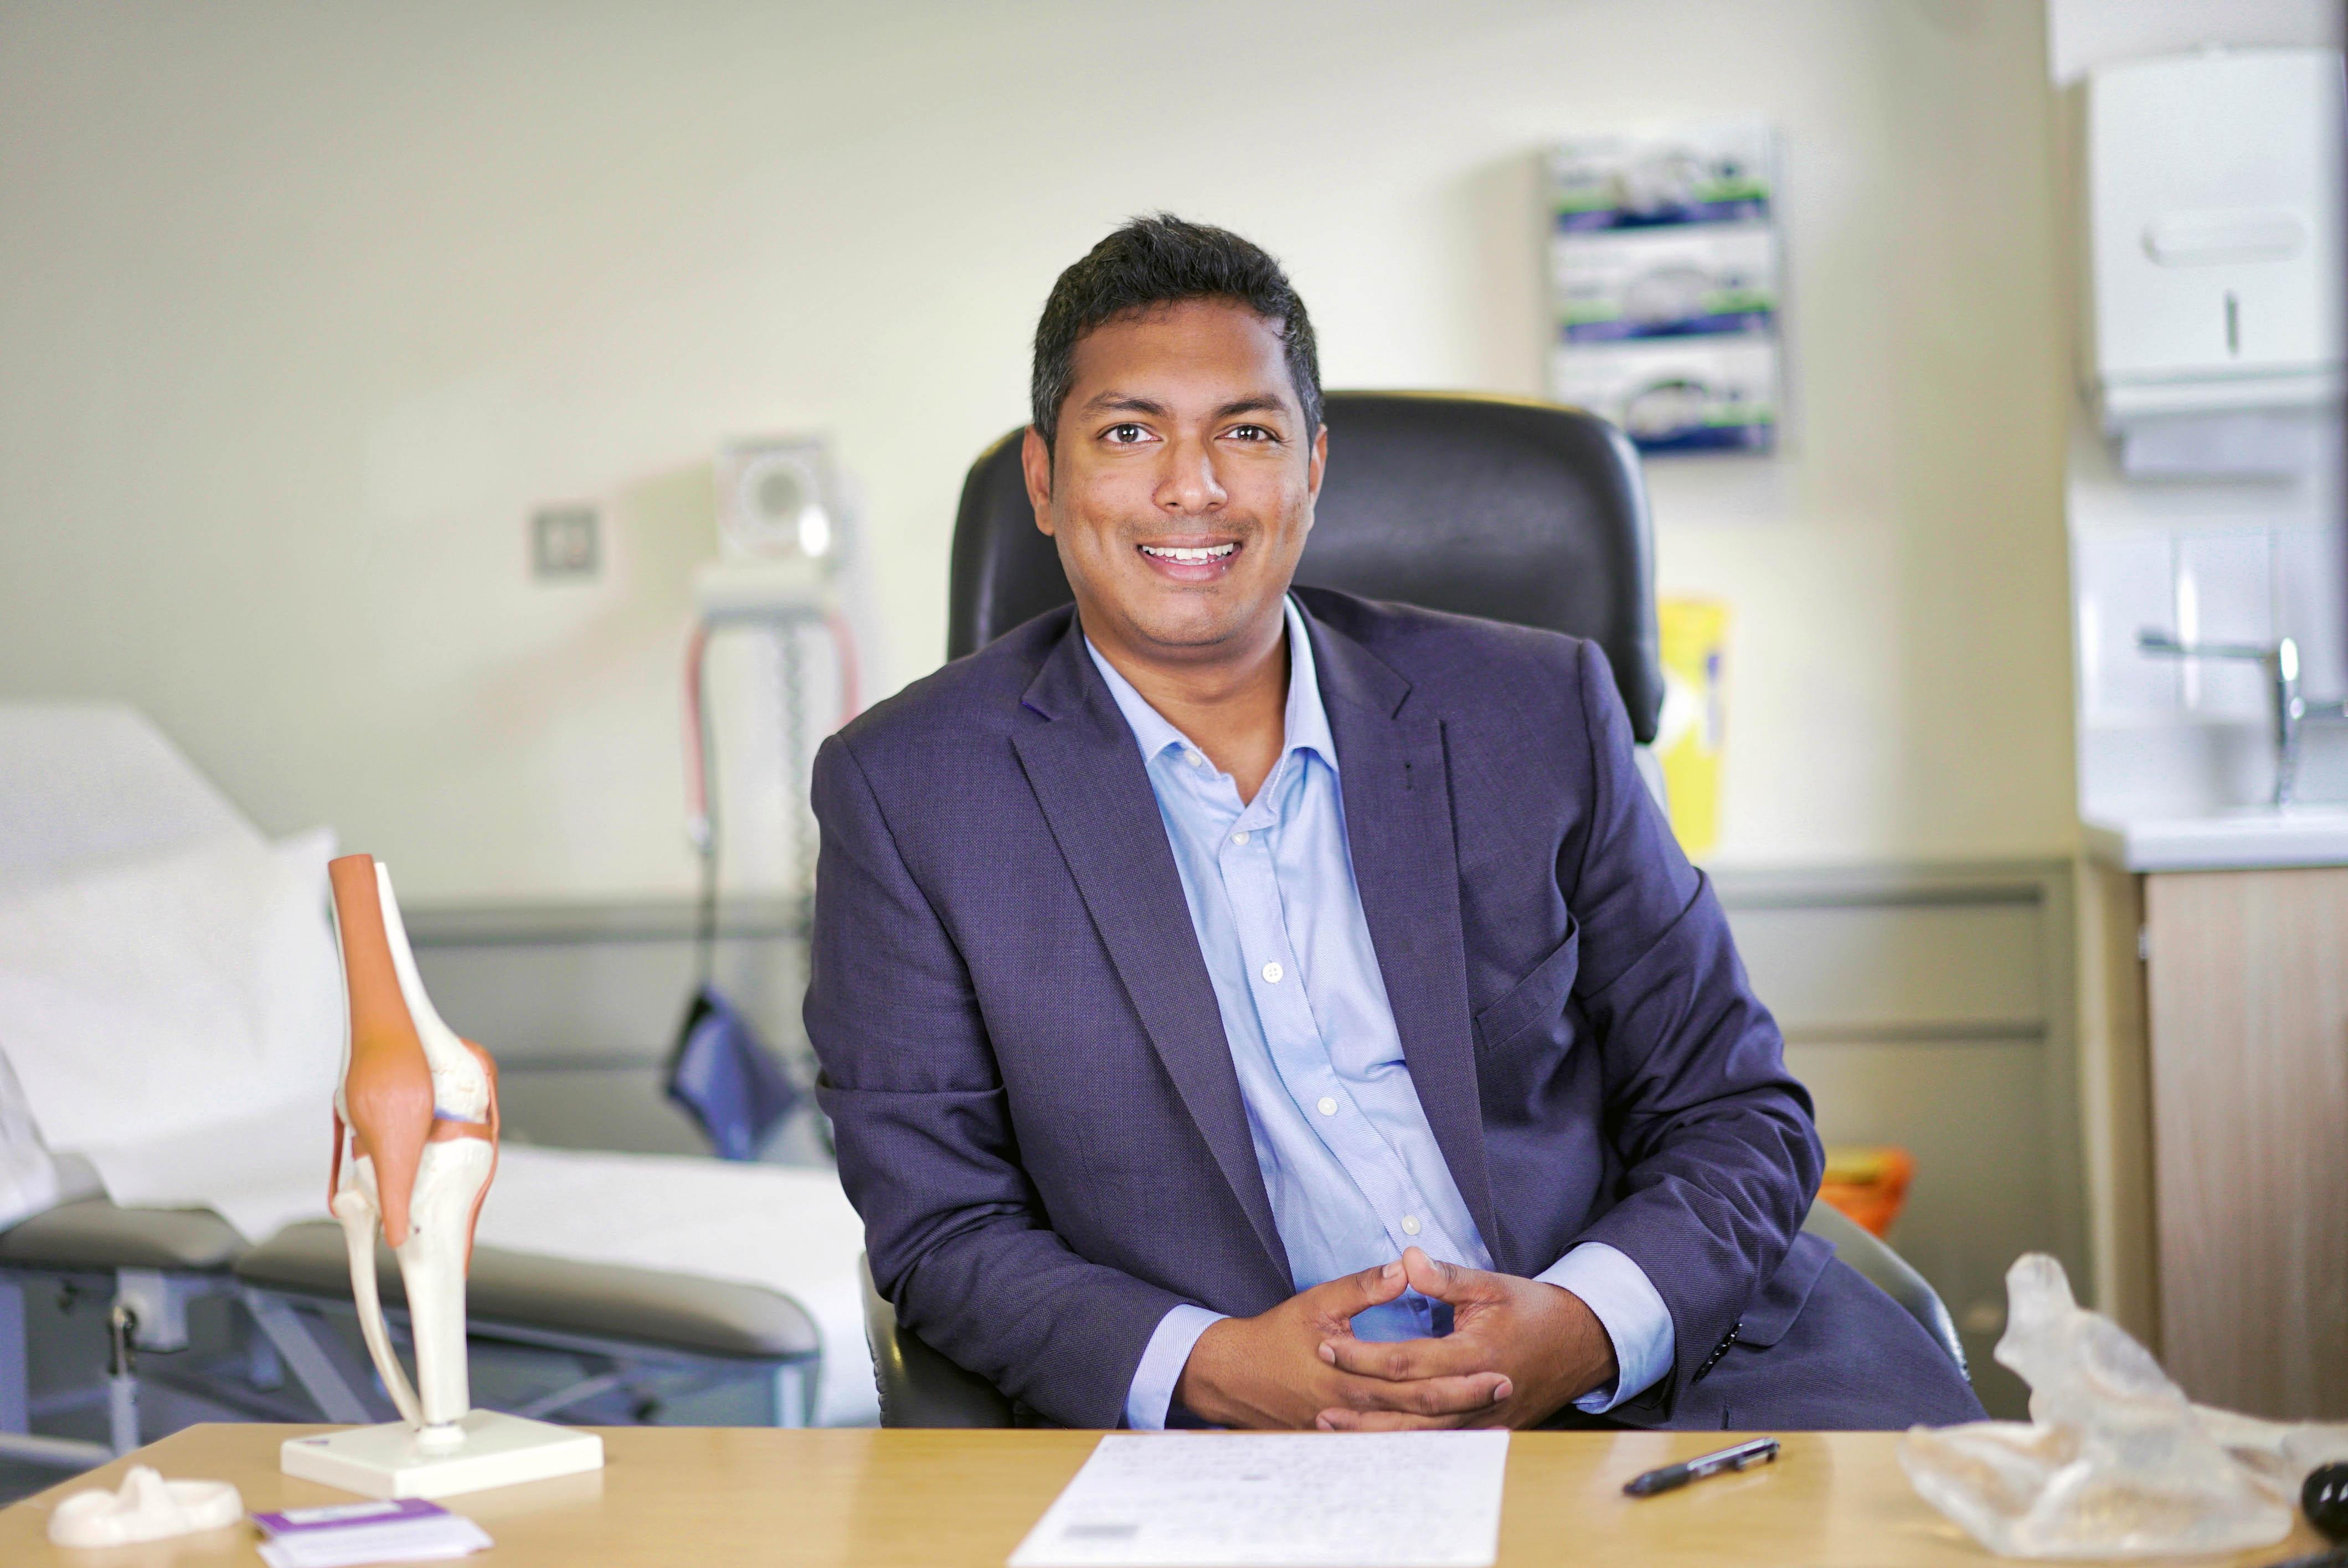 Knee stem cell clinic london